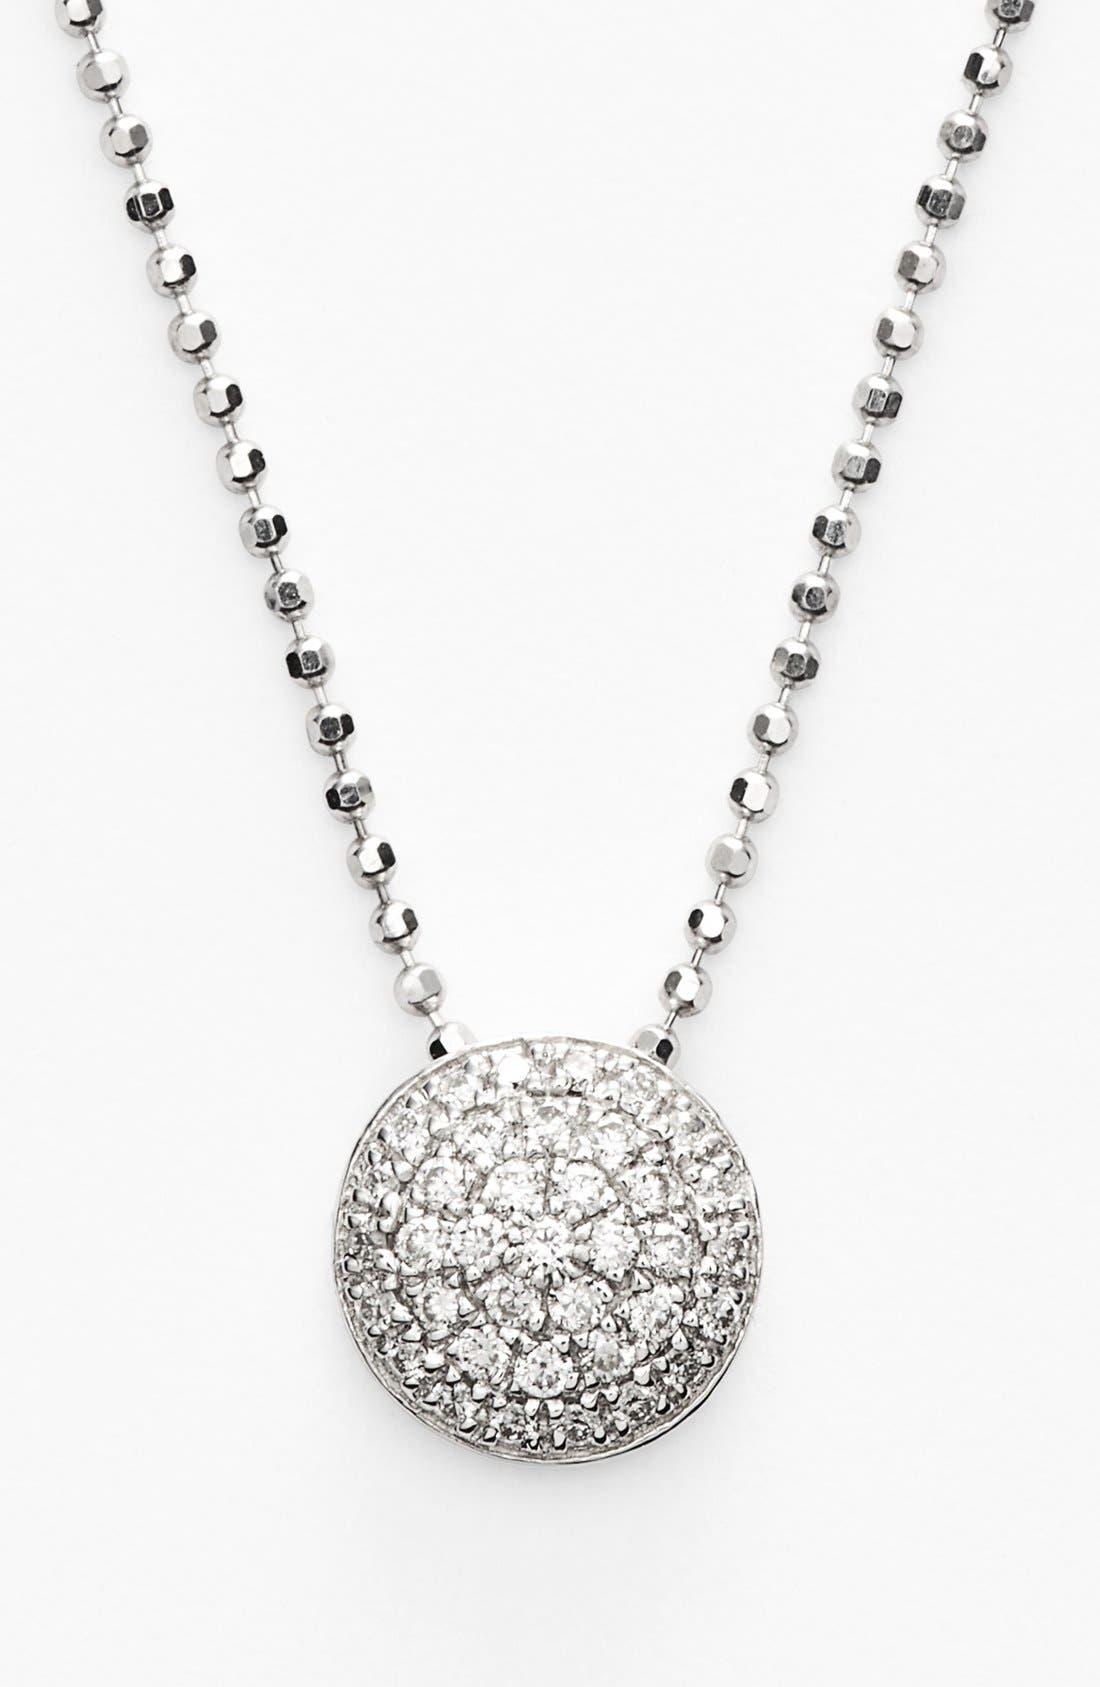 Alternate Image 1 Selected - Bony Levy 'Eclipse' Pavé Diamond Pendant Necklace (Nordstrom Exclusive)